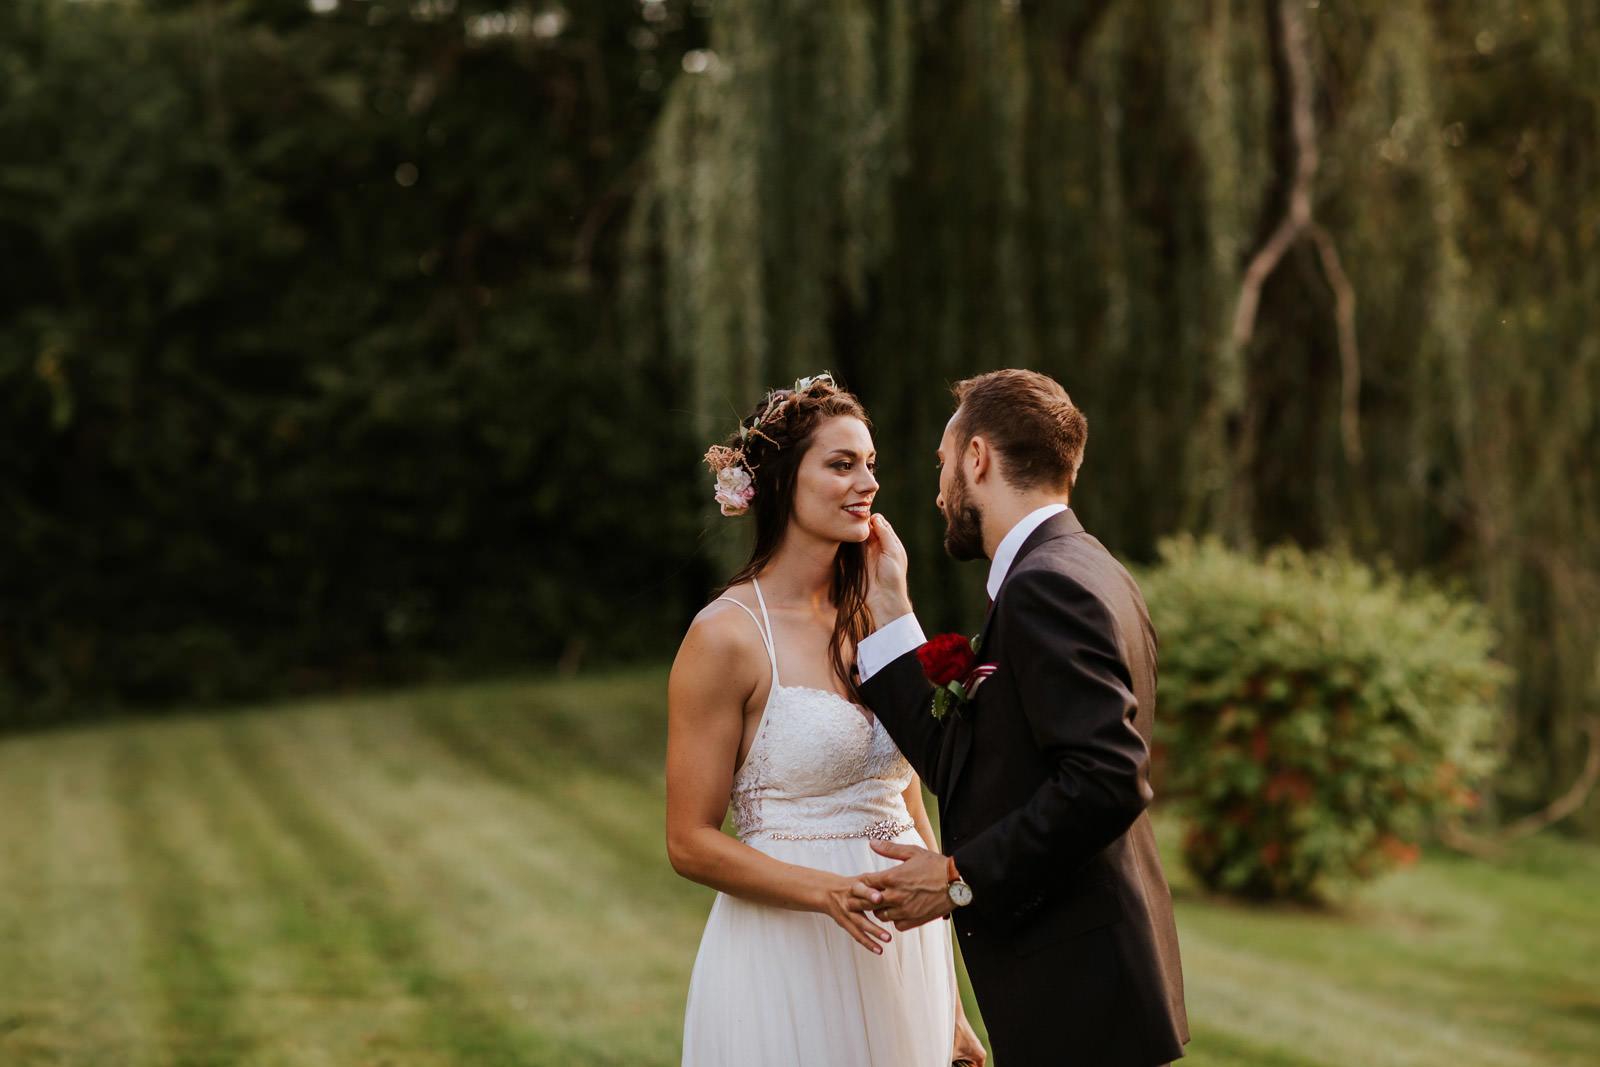 Destination Wedding Photographer Chicago